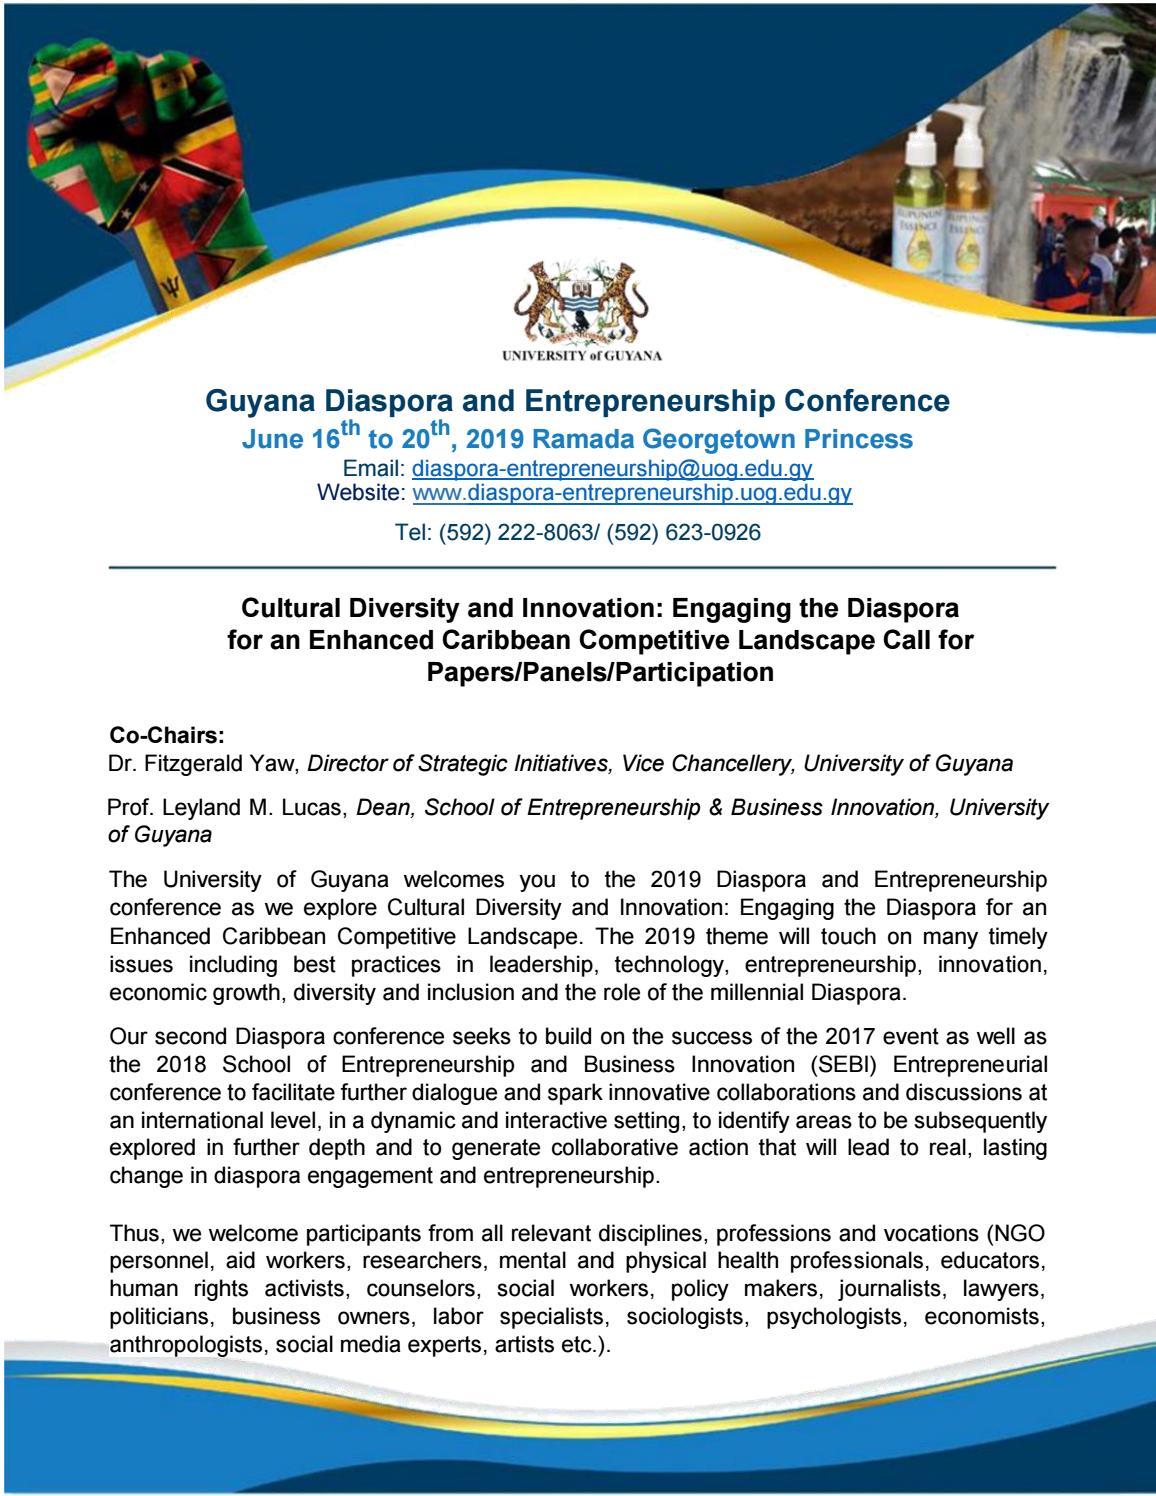 Guyana Diaspora and Entrepreneurship Conference by Guyana